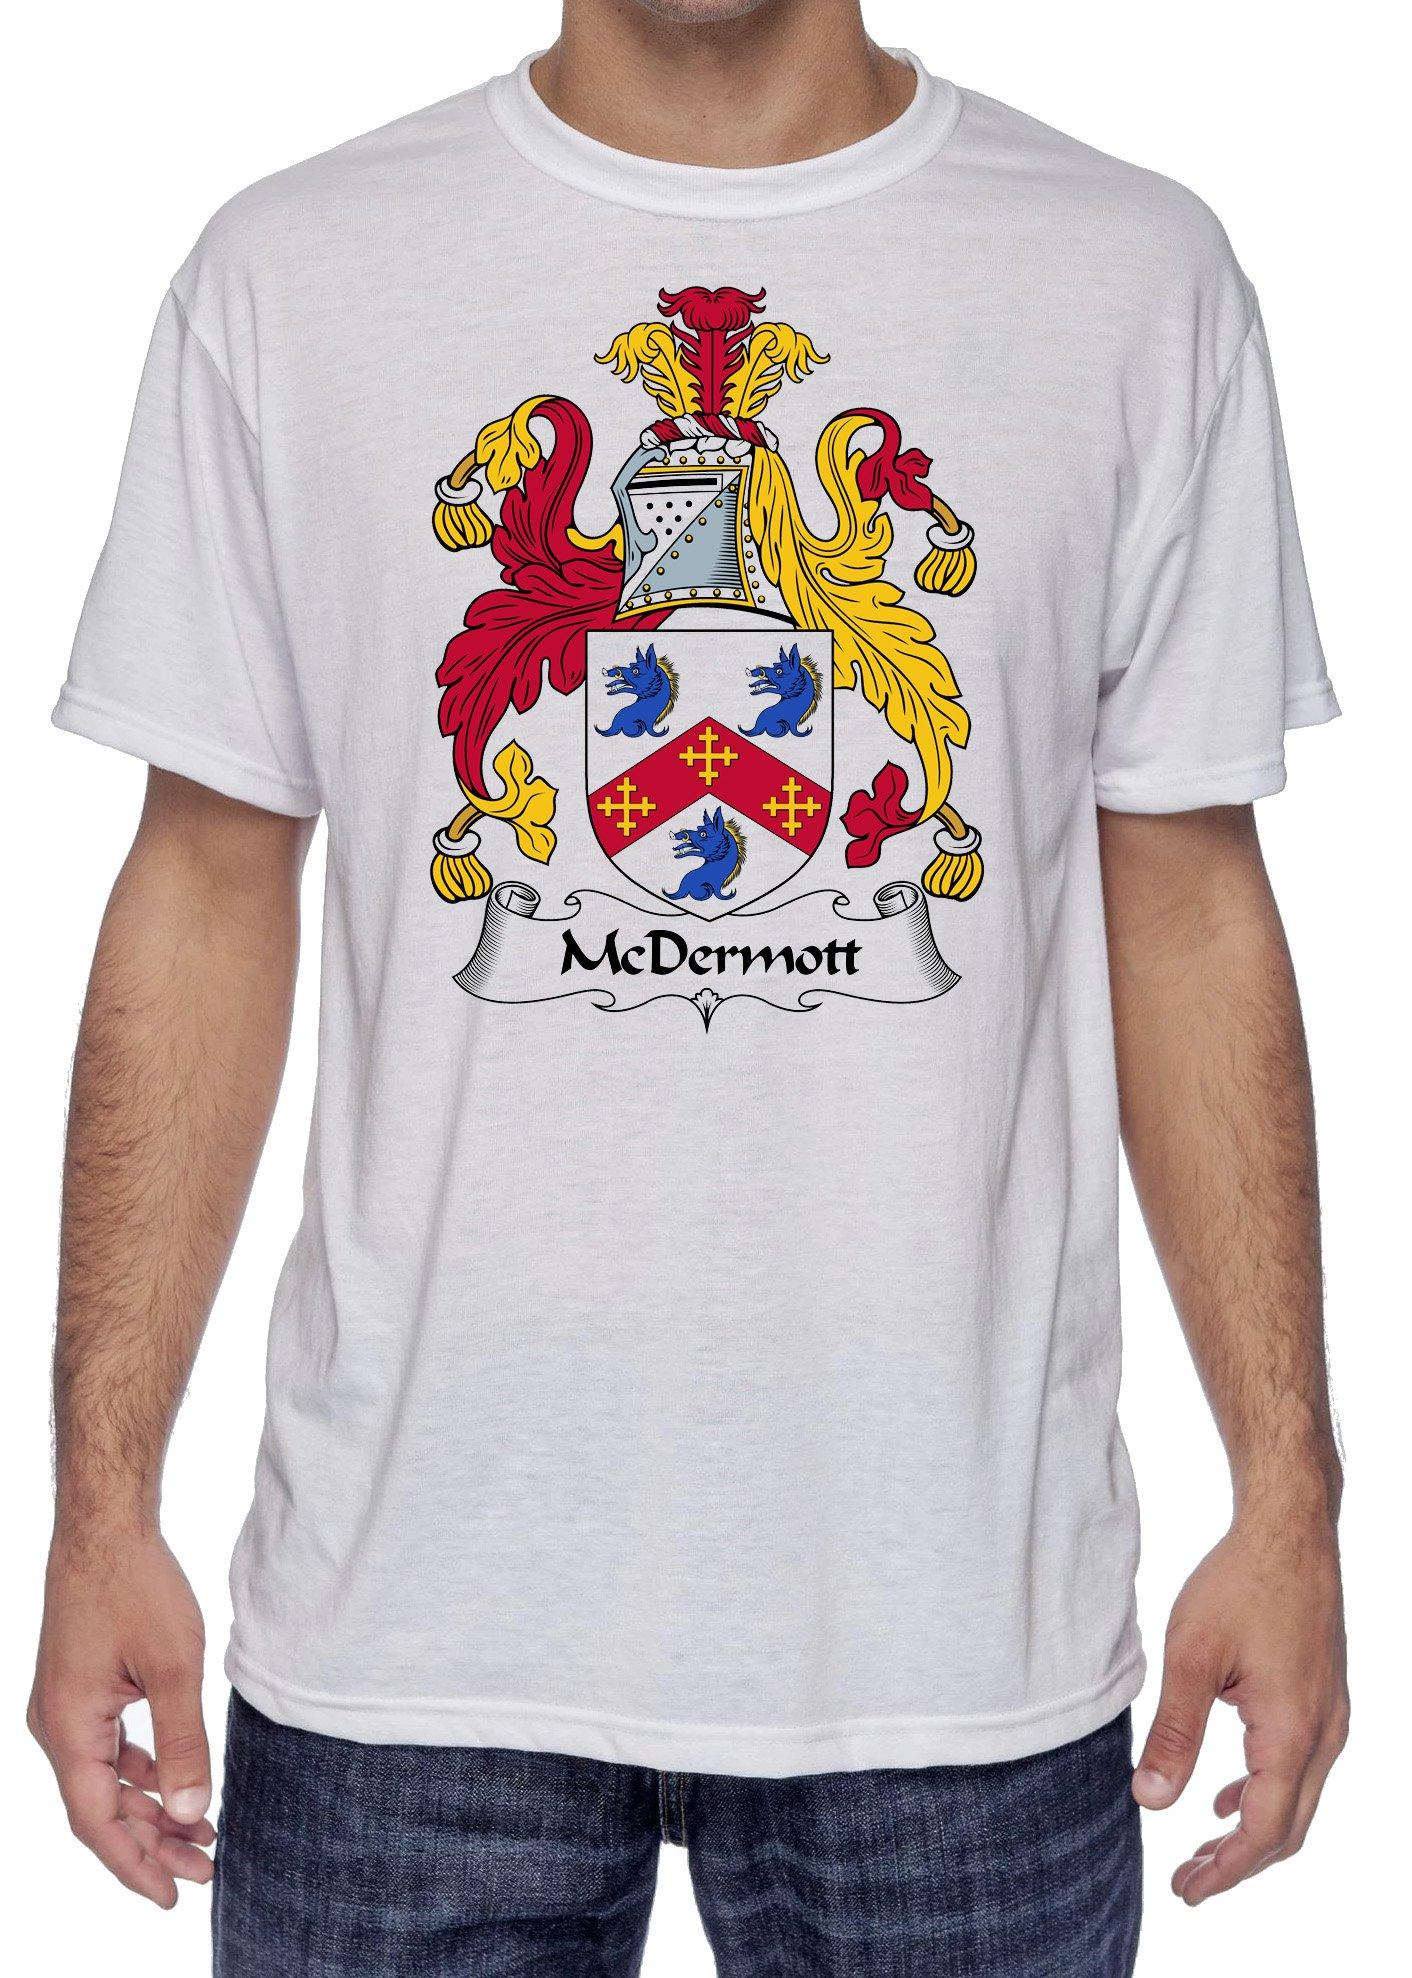 McDermott Coat of Arms-Family Crest, Moister Wicking Sports T-Shirt X-Large White